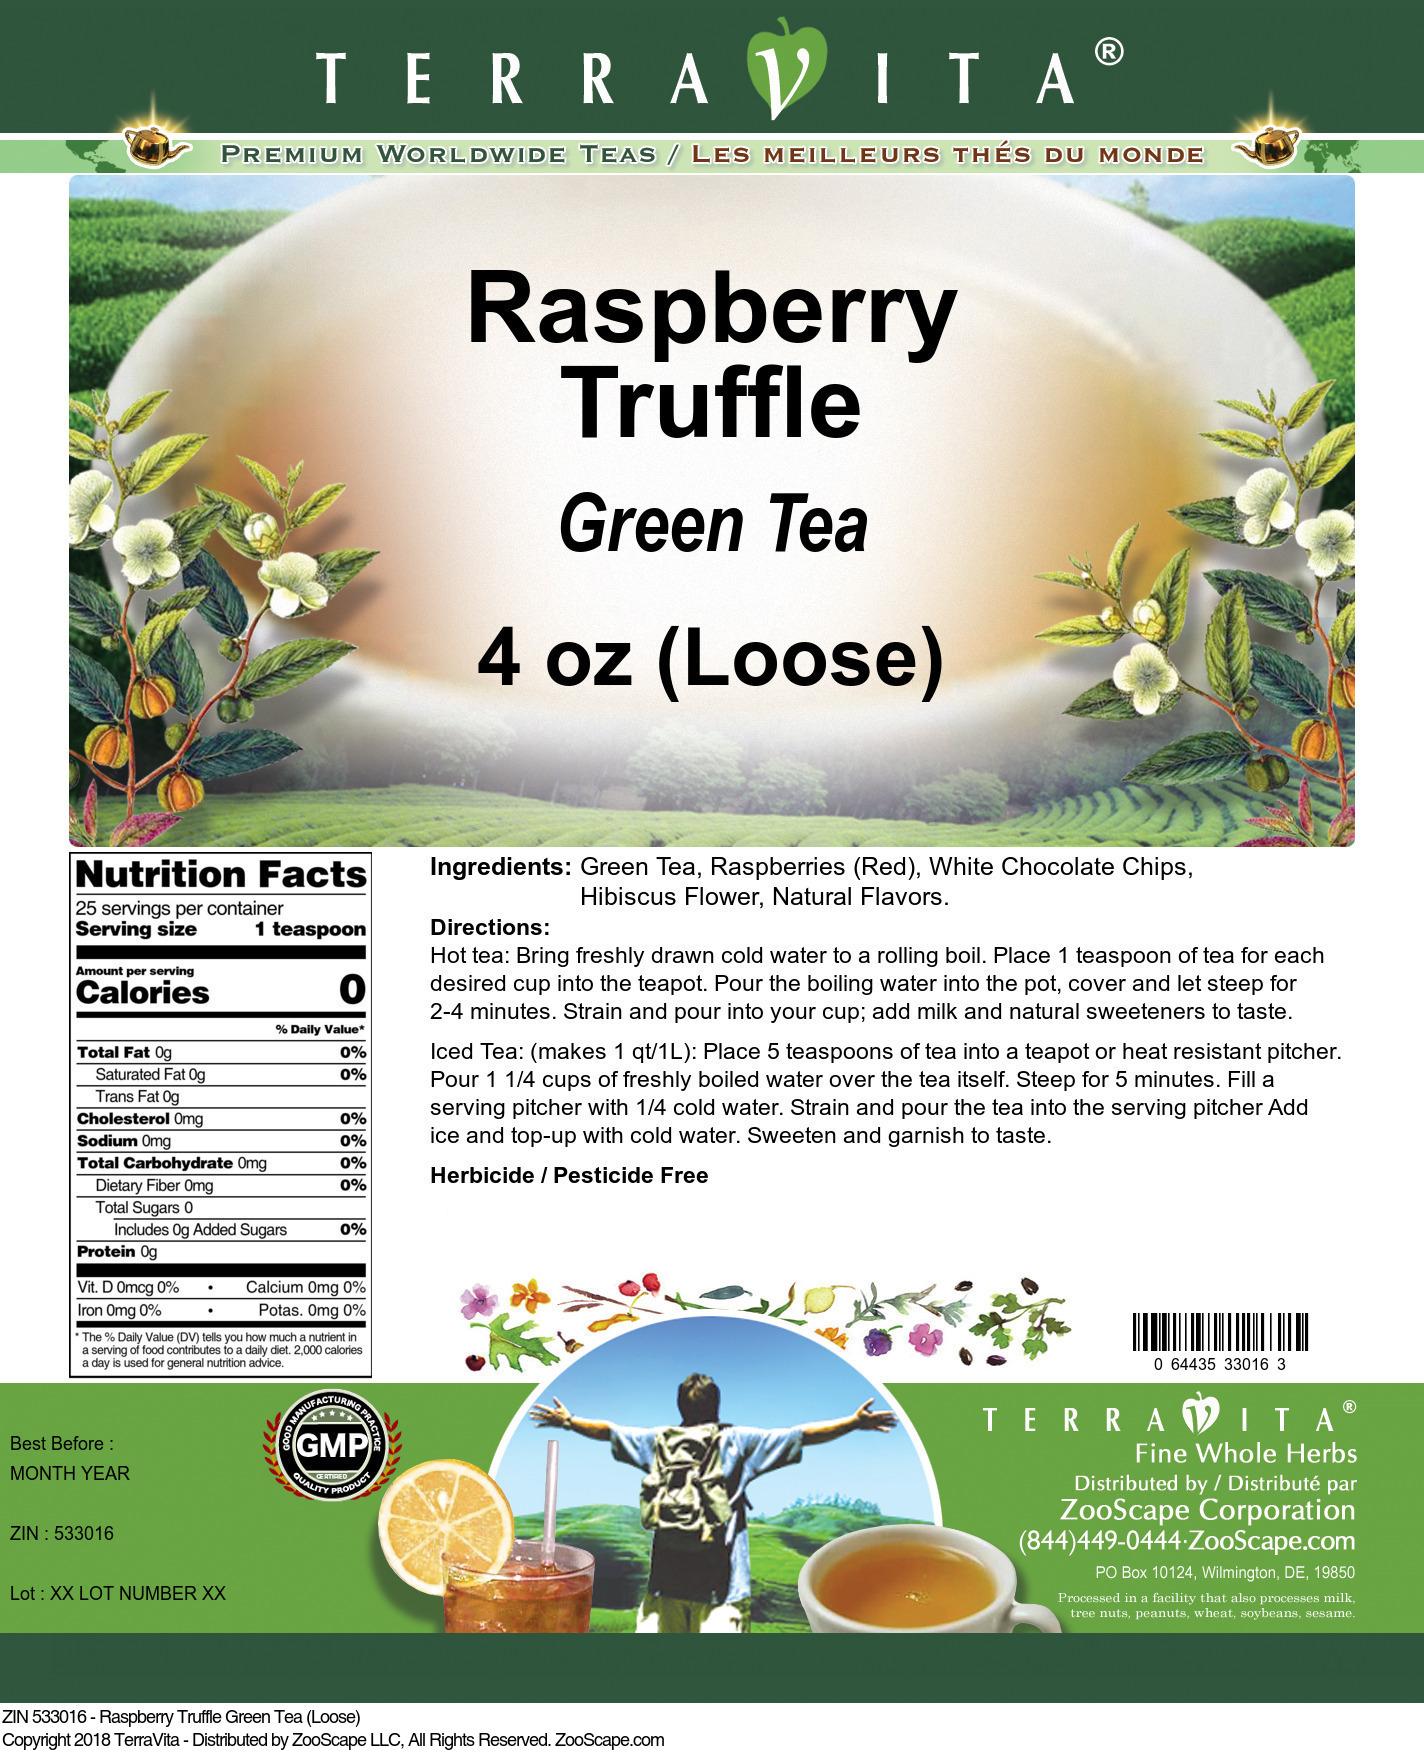 Raspberry Truffle Green Tea